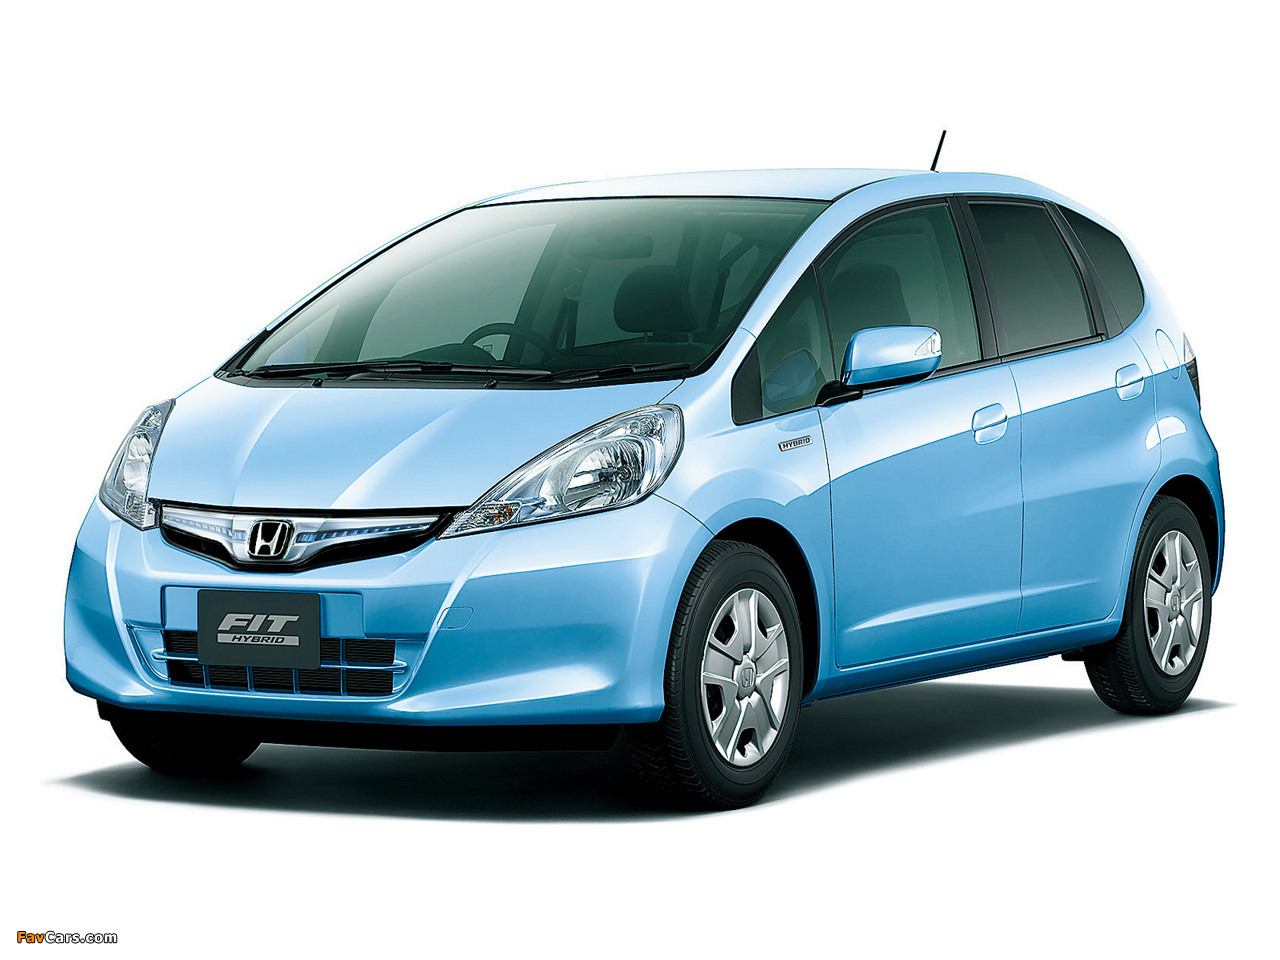 Images Of Honda Fit Hybrid Gp1 2012 13 1280x960